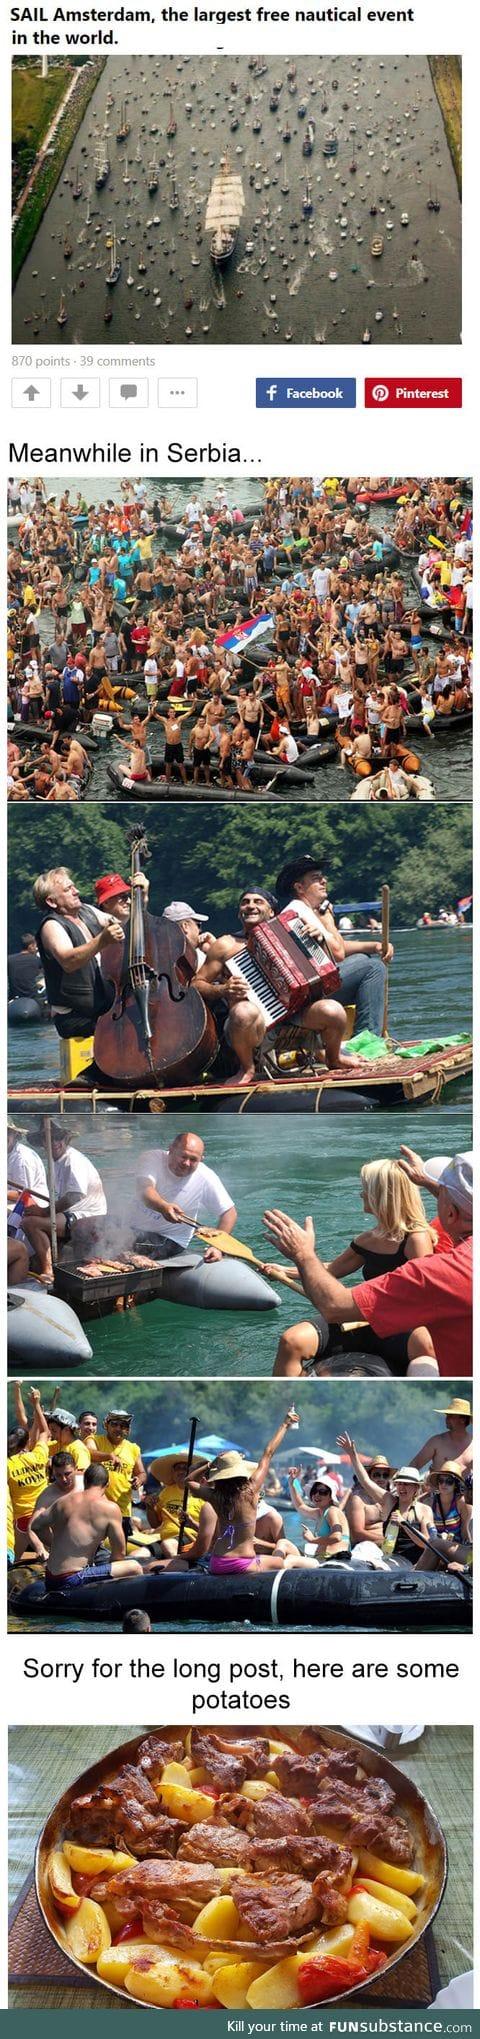 Event is called Drinska regata